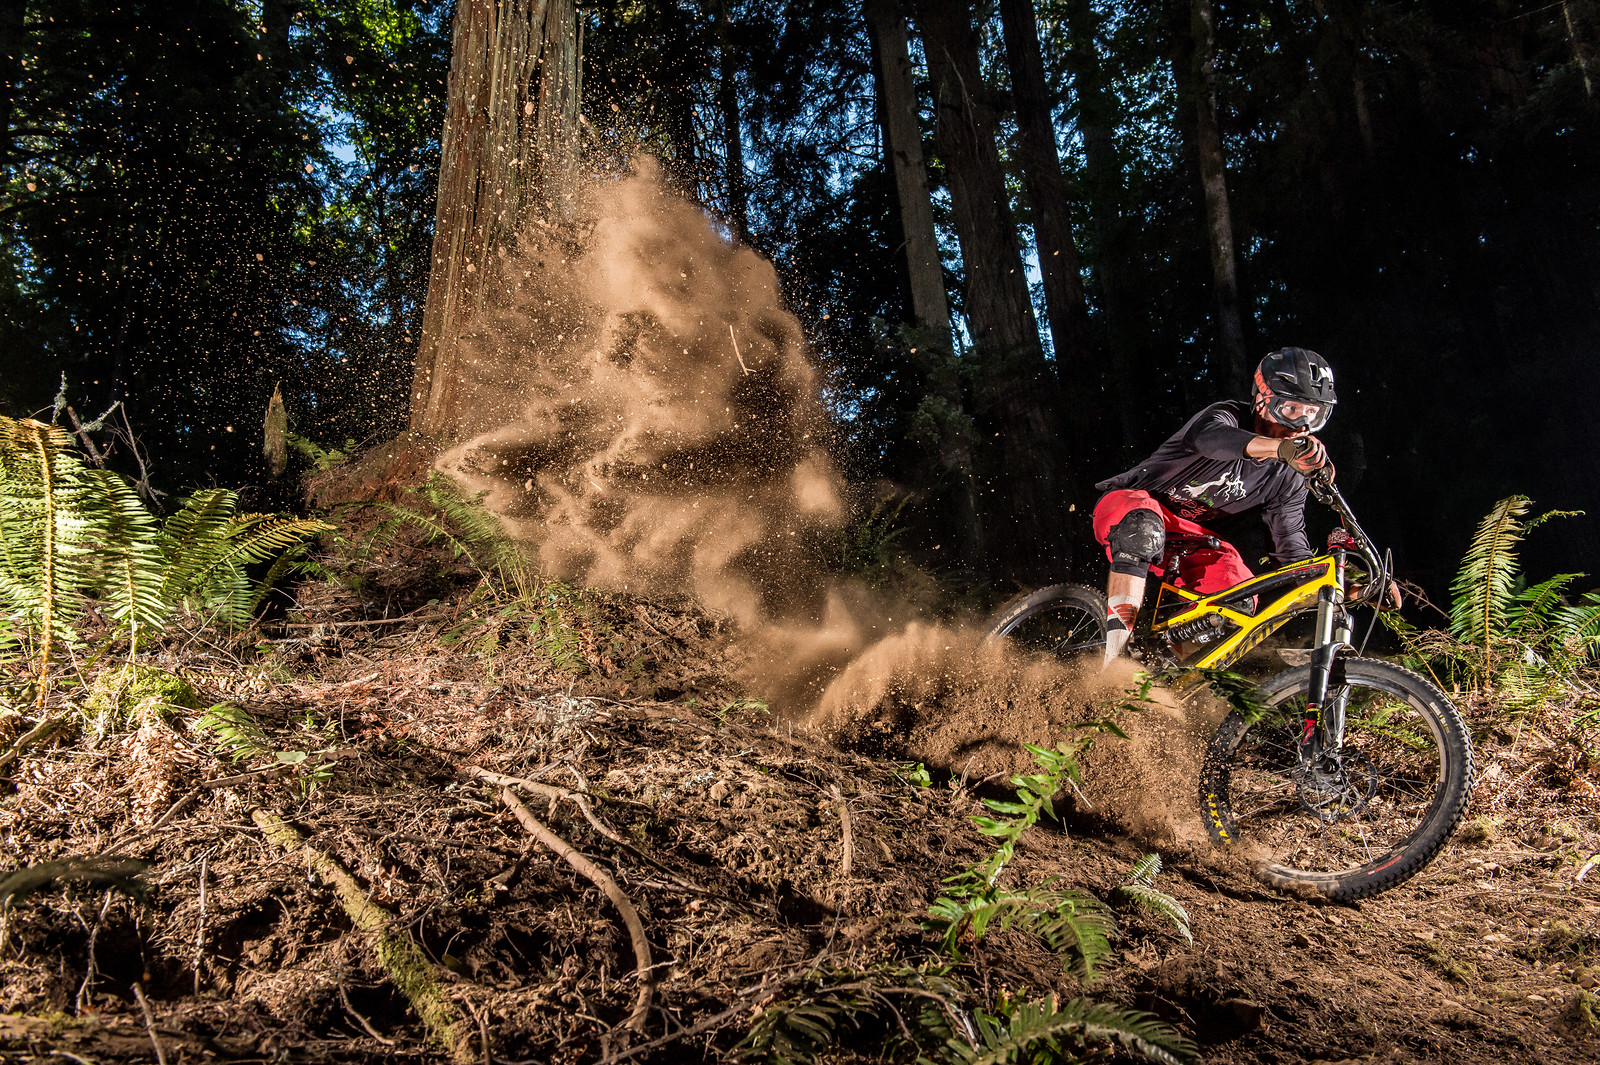 Exploder - Dobbs - Mountain Biking Pictures - Vital MTB